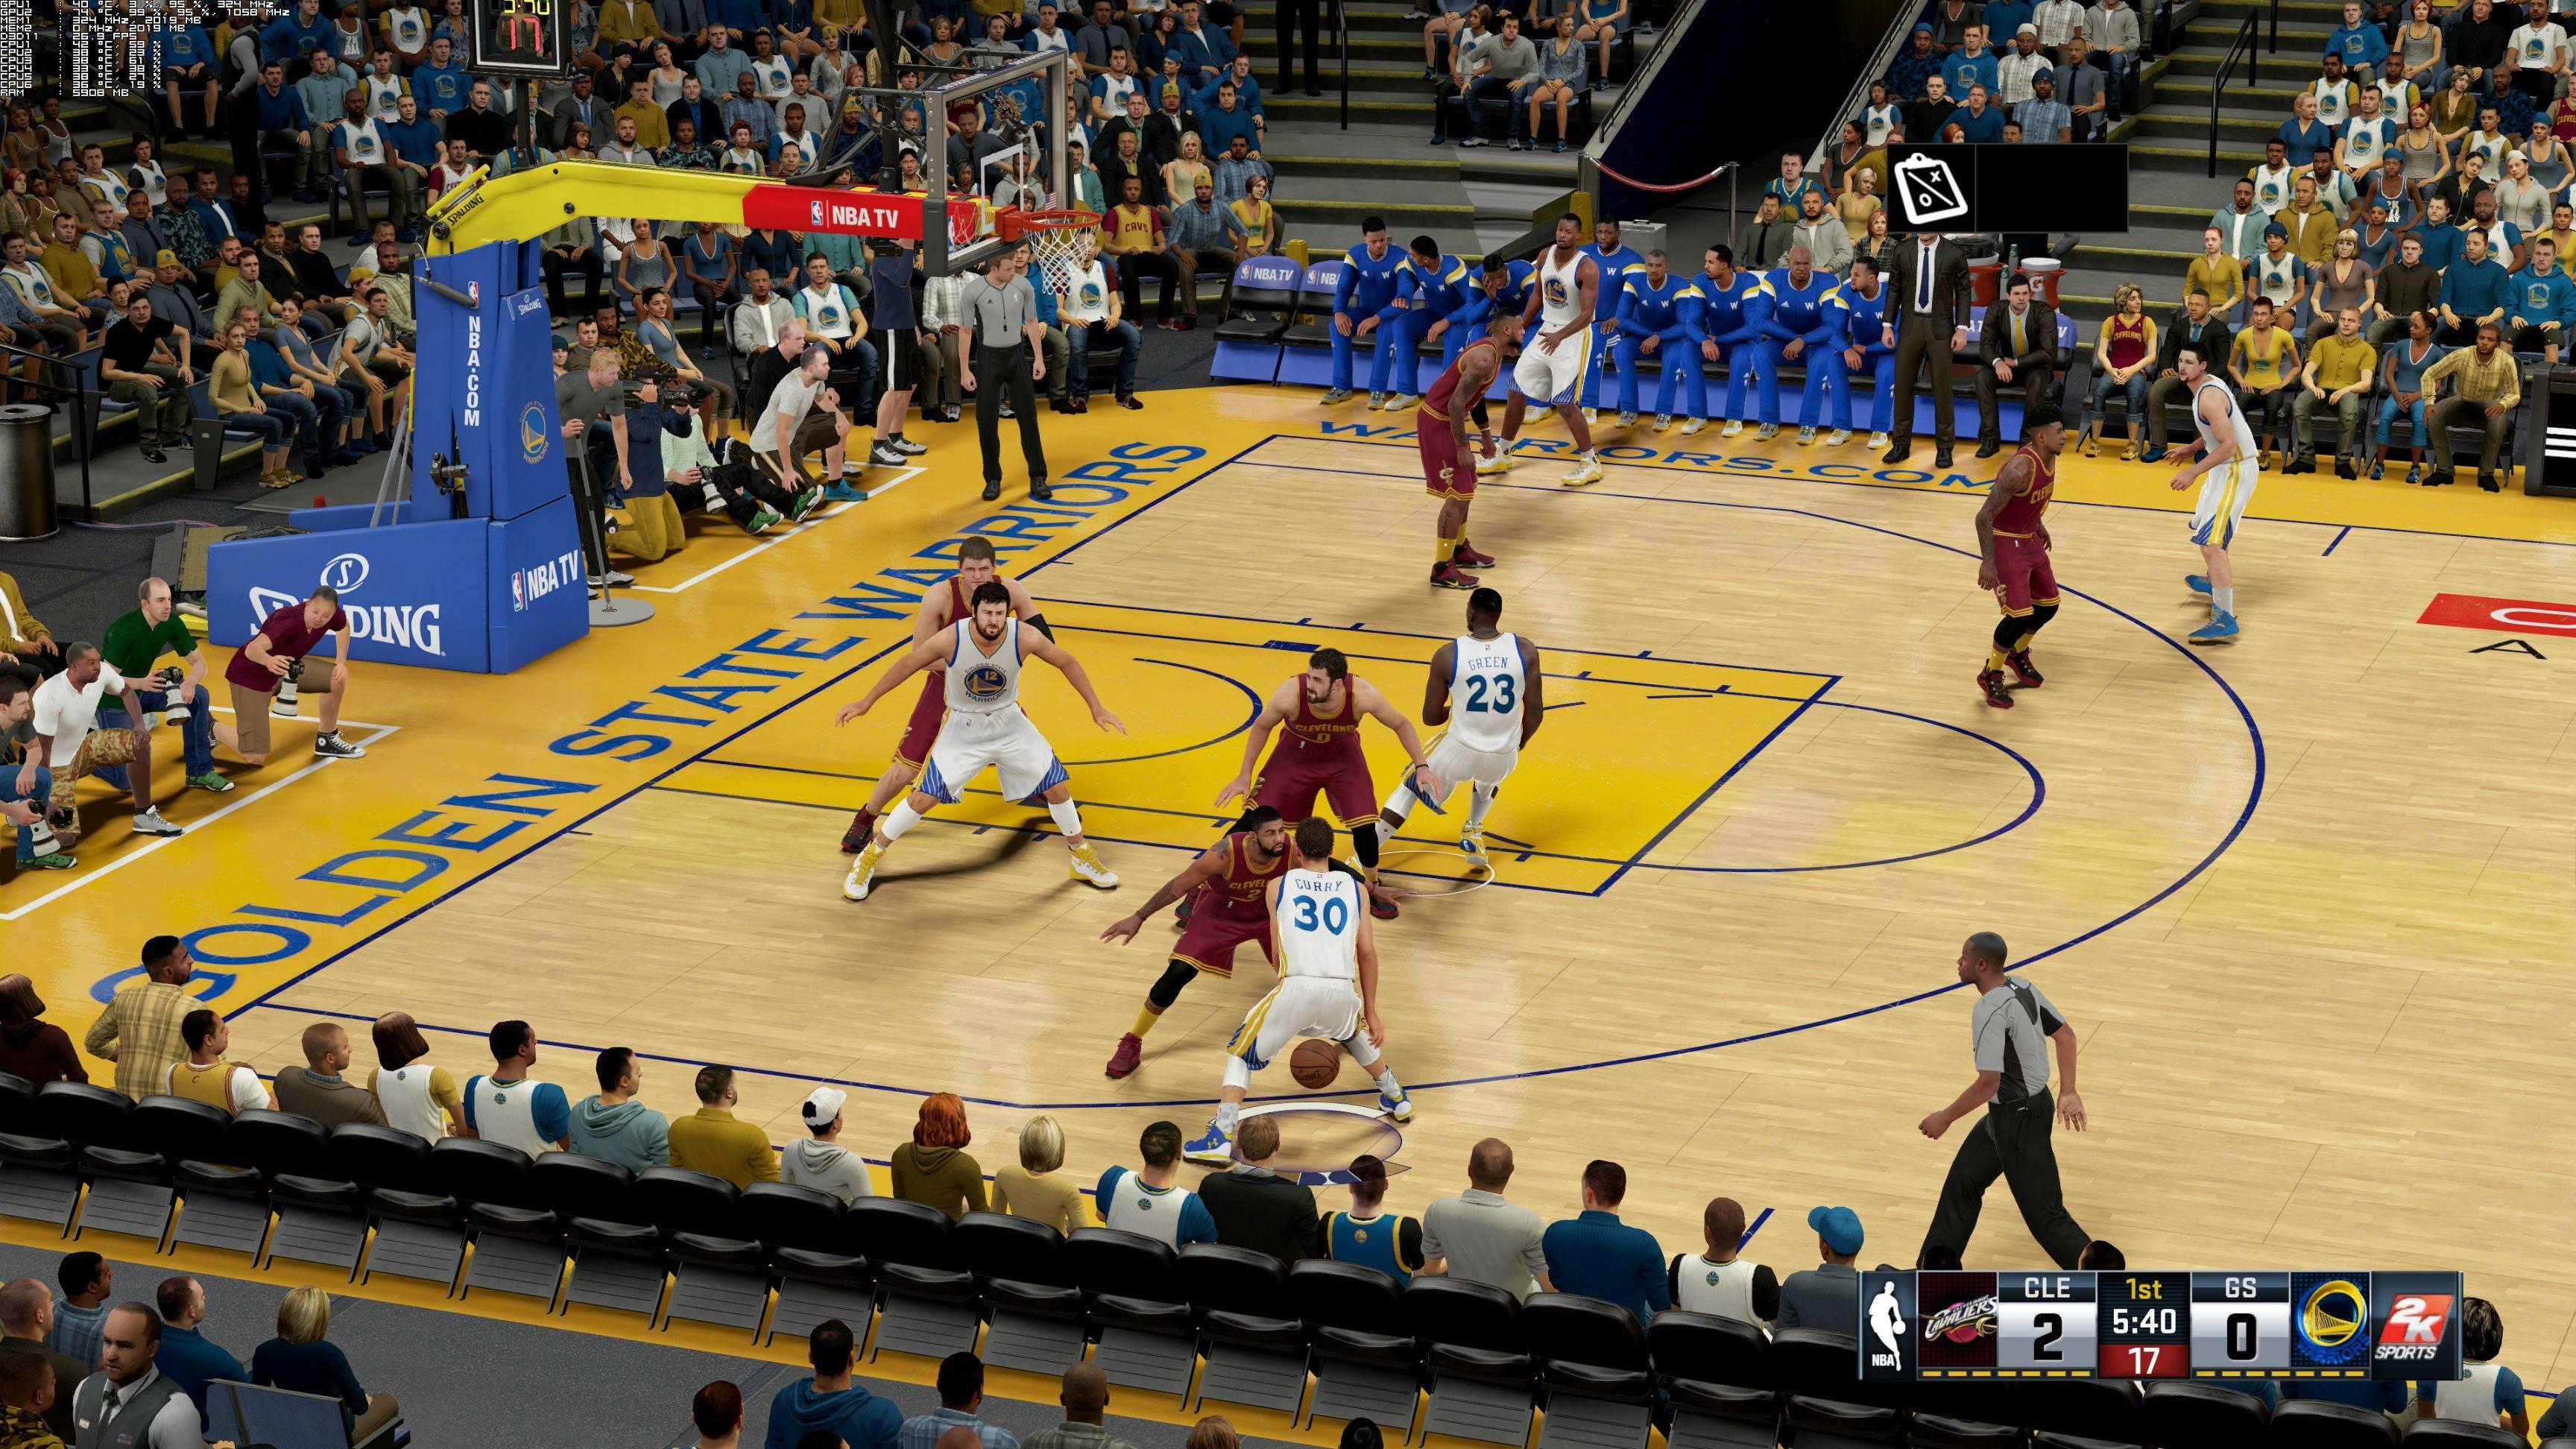 NBA 2K16 image #3